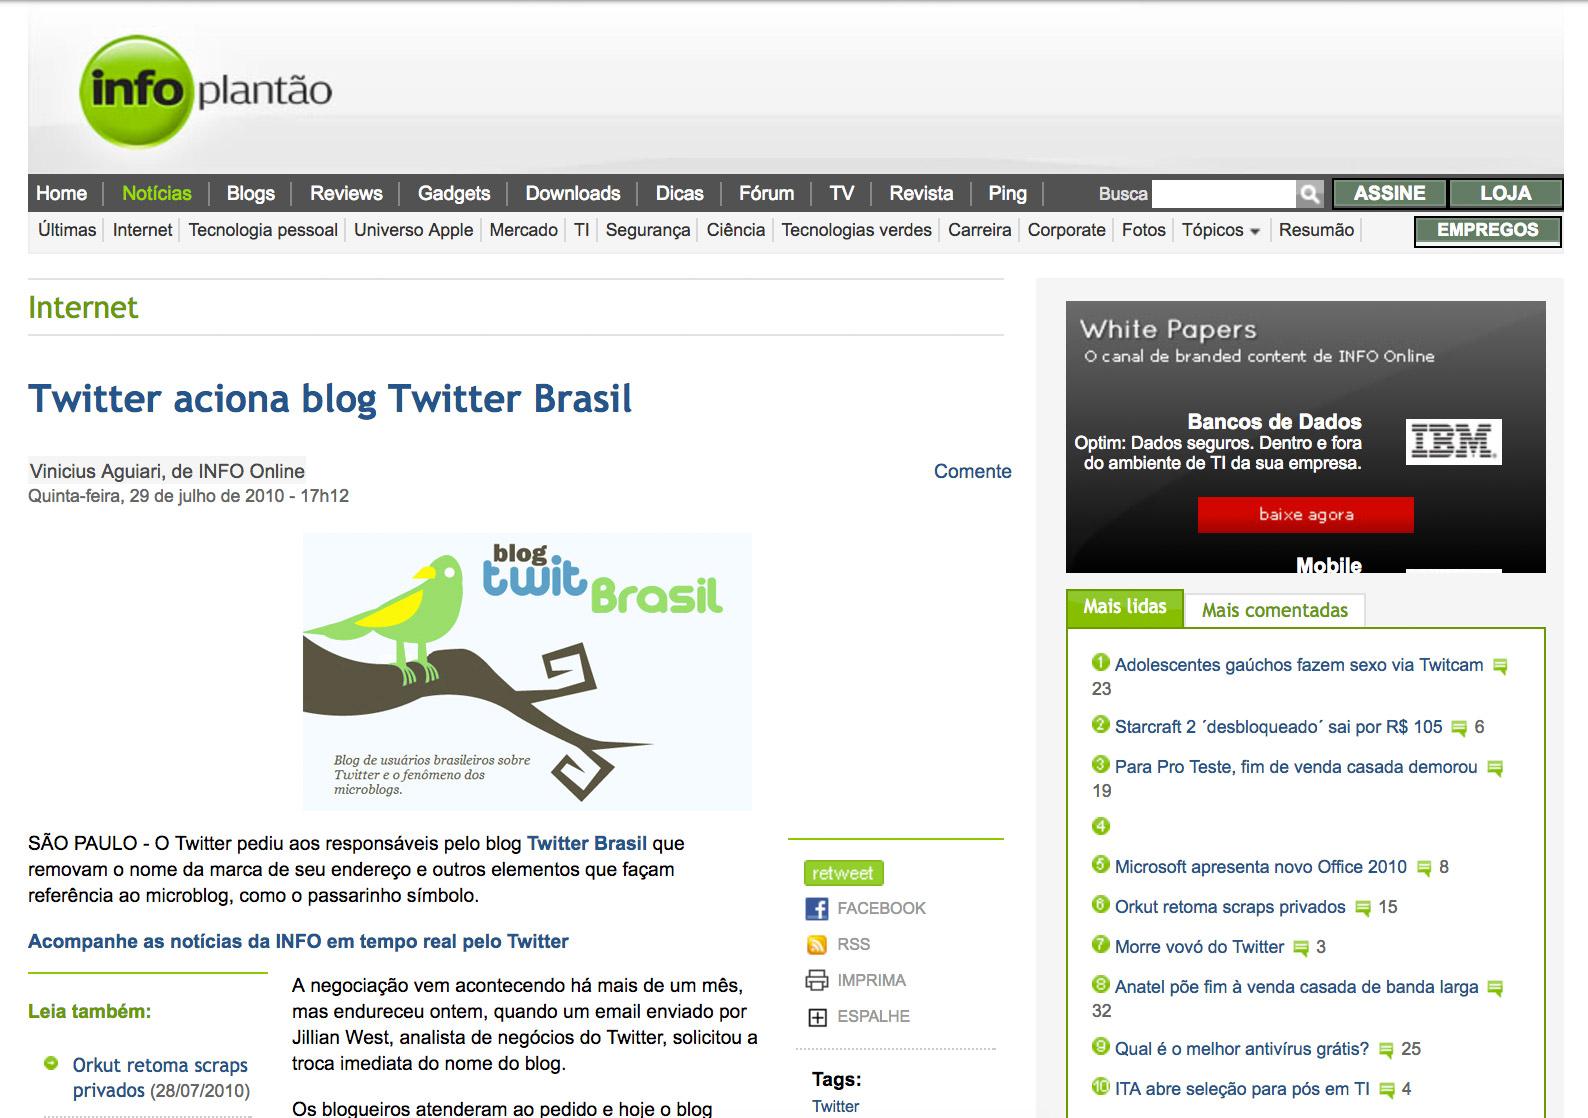 Twitter Fecha Blog Brasileiro - #freeTwitterBrasil - Fernando Souza